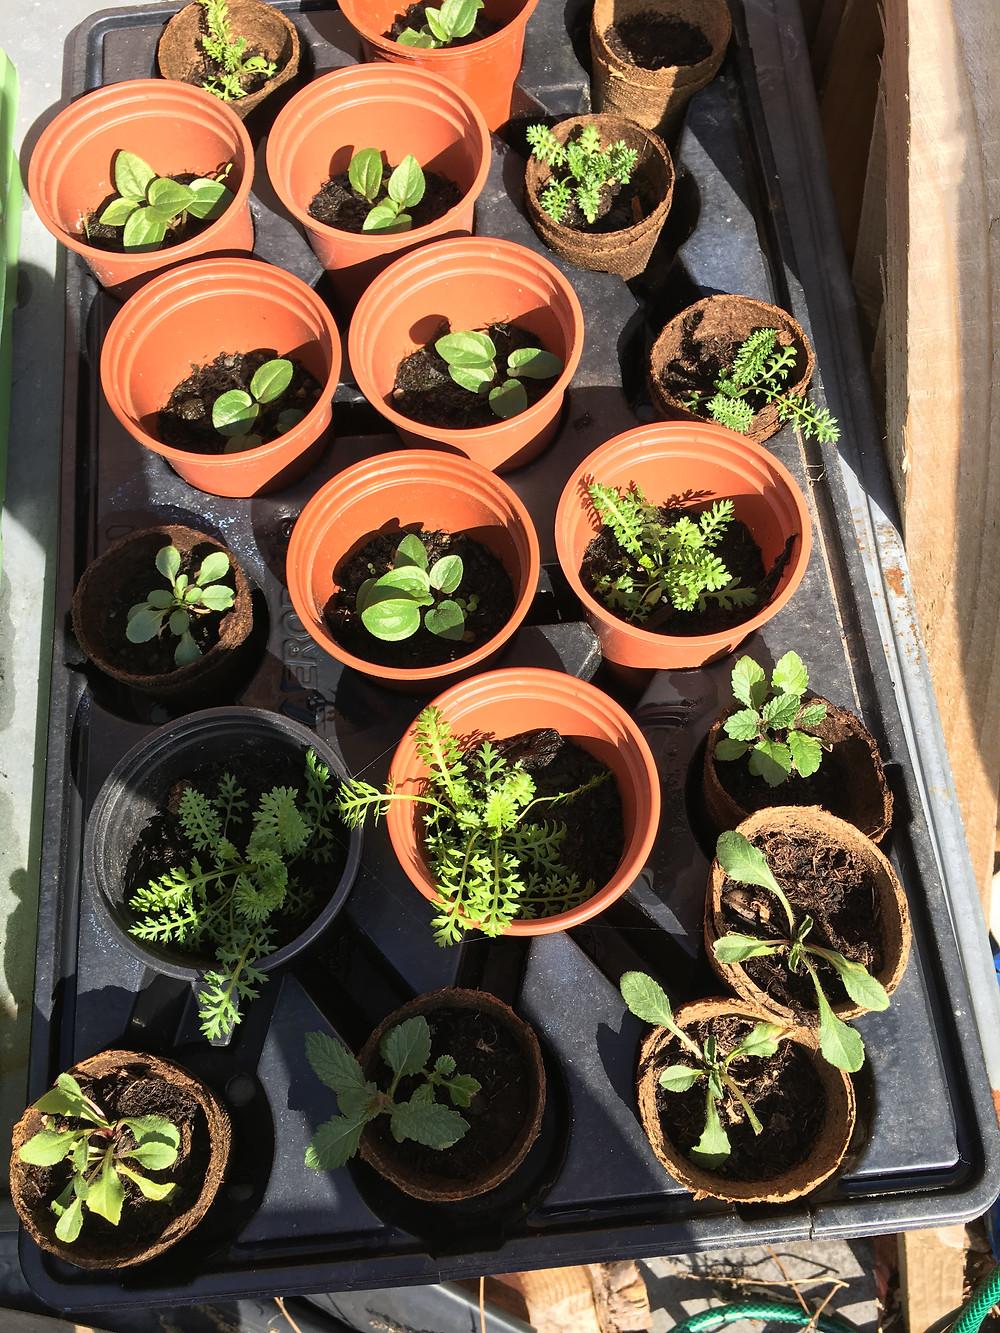 seedlings I am nurturing